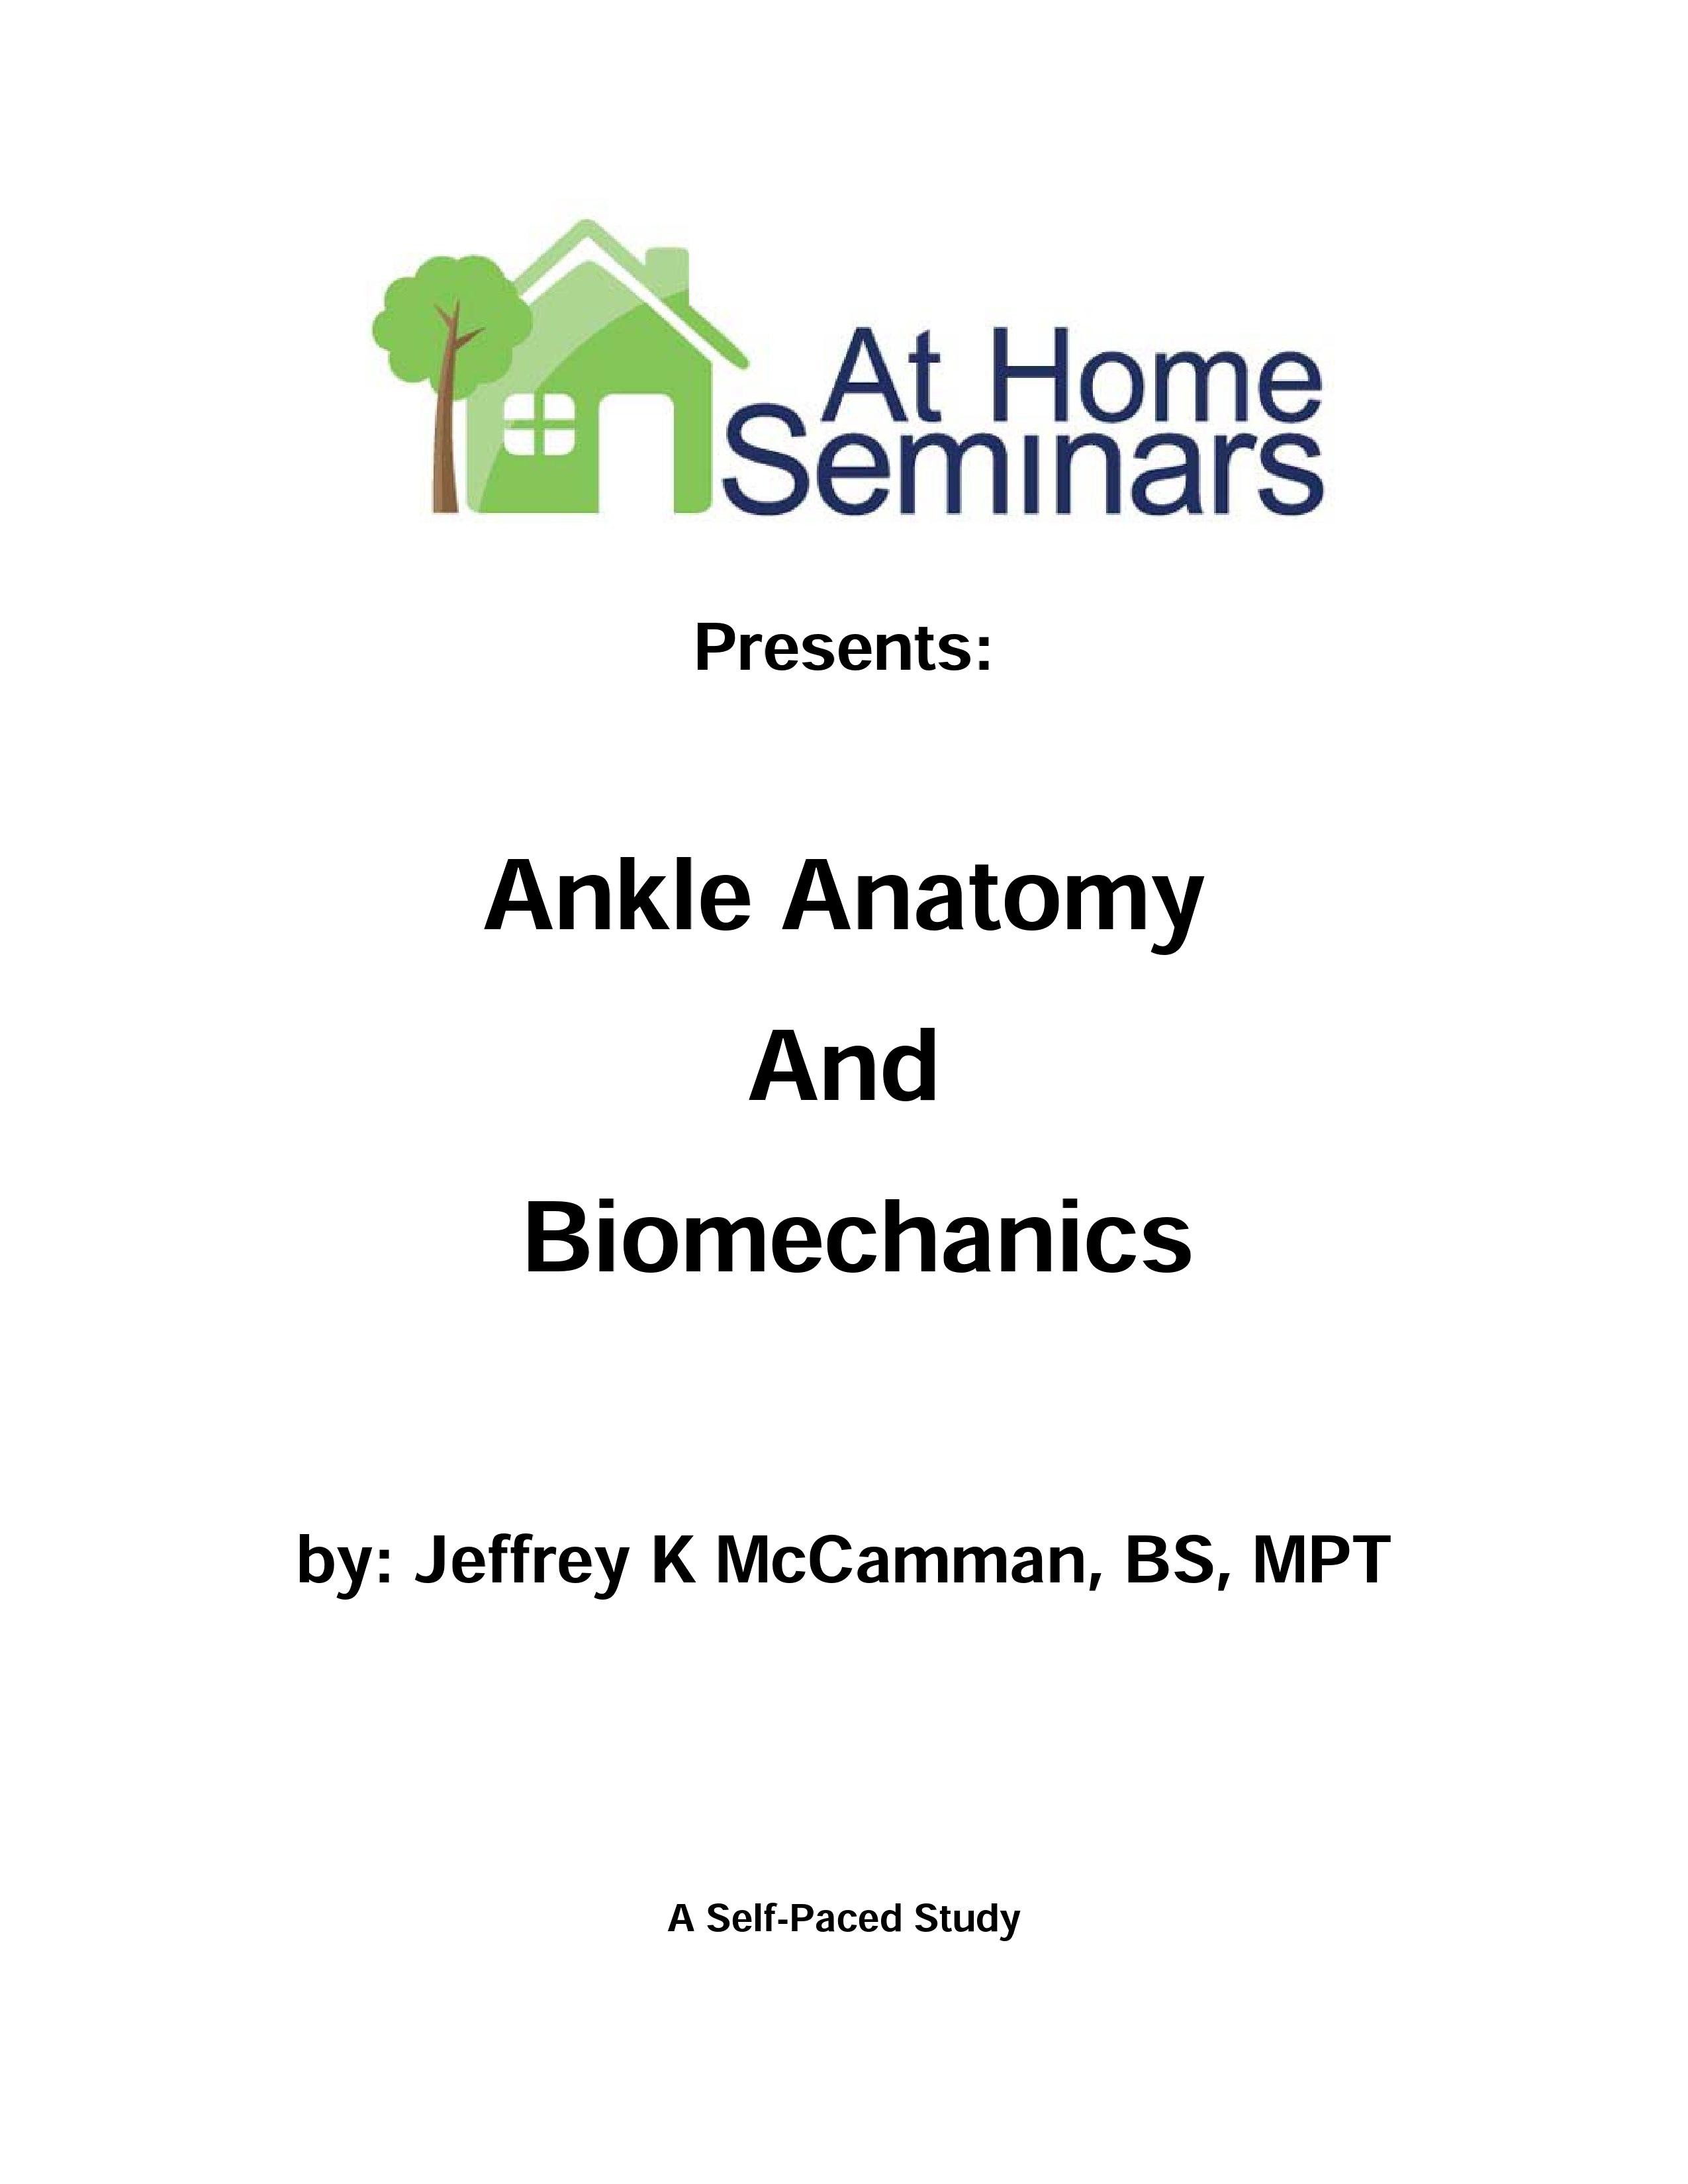 Ankle Anatomy & Biomechanics (Electronic Download)